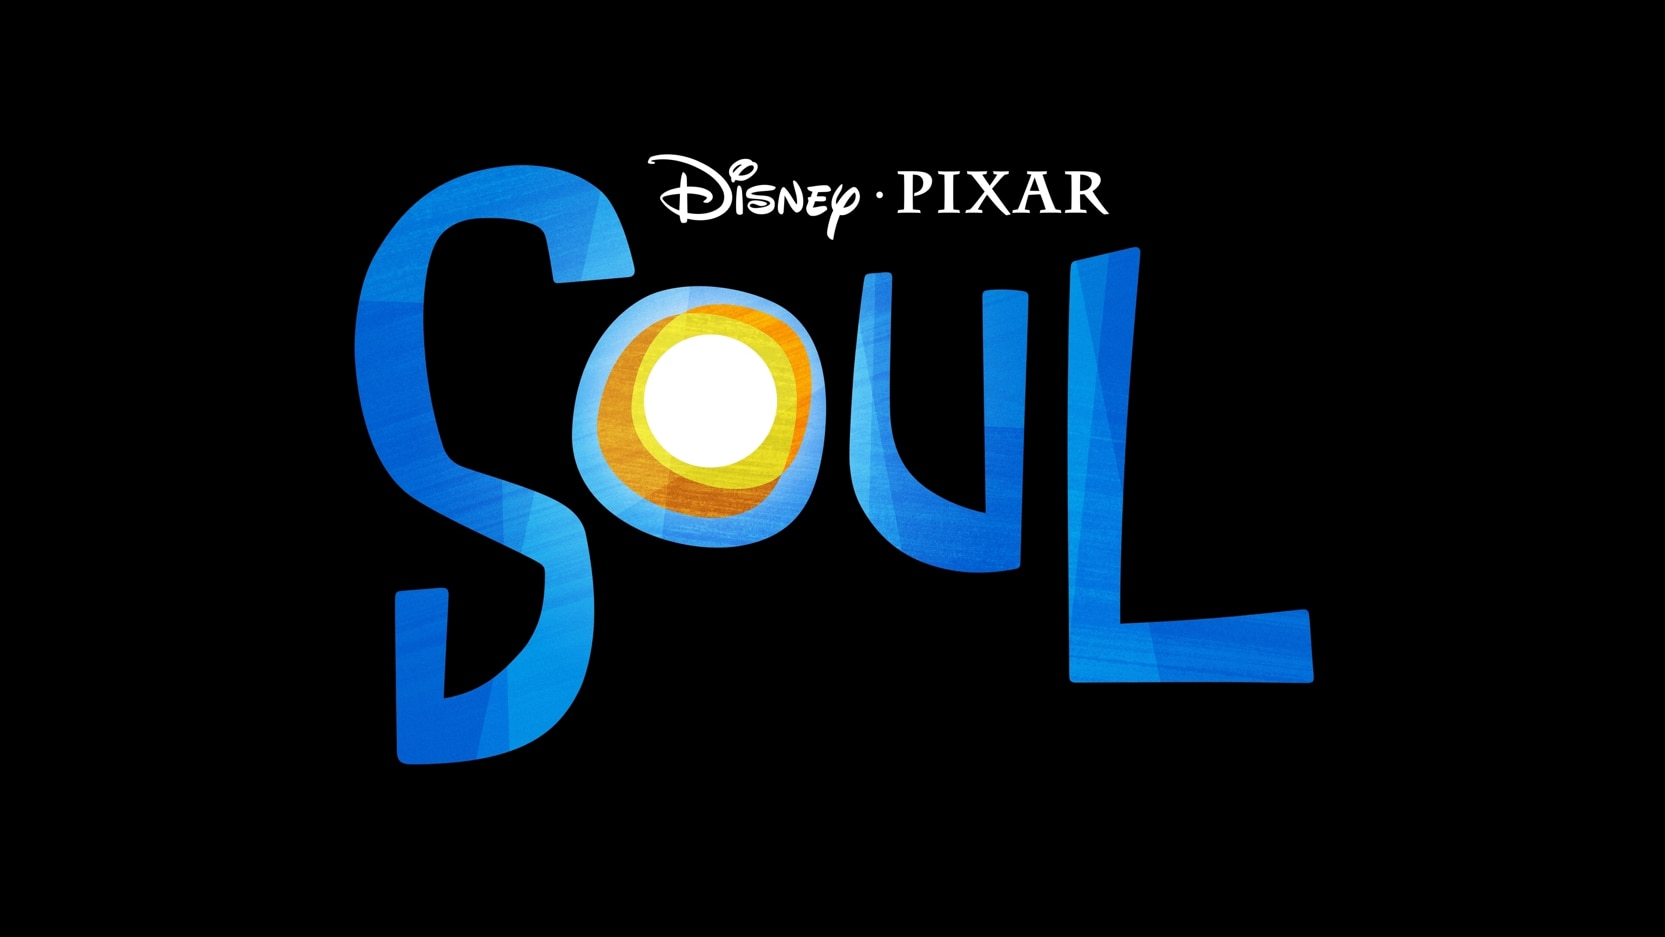 Disney and Pixar announce UK artist Celeste as end-credit vocal on Soul Movie soundtrack